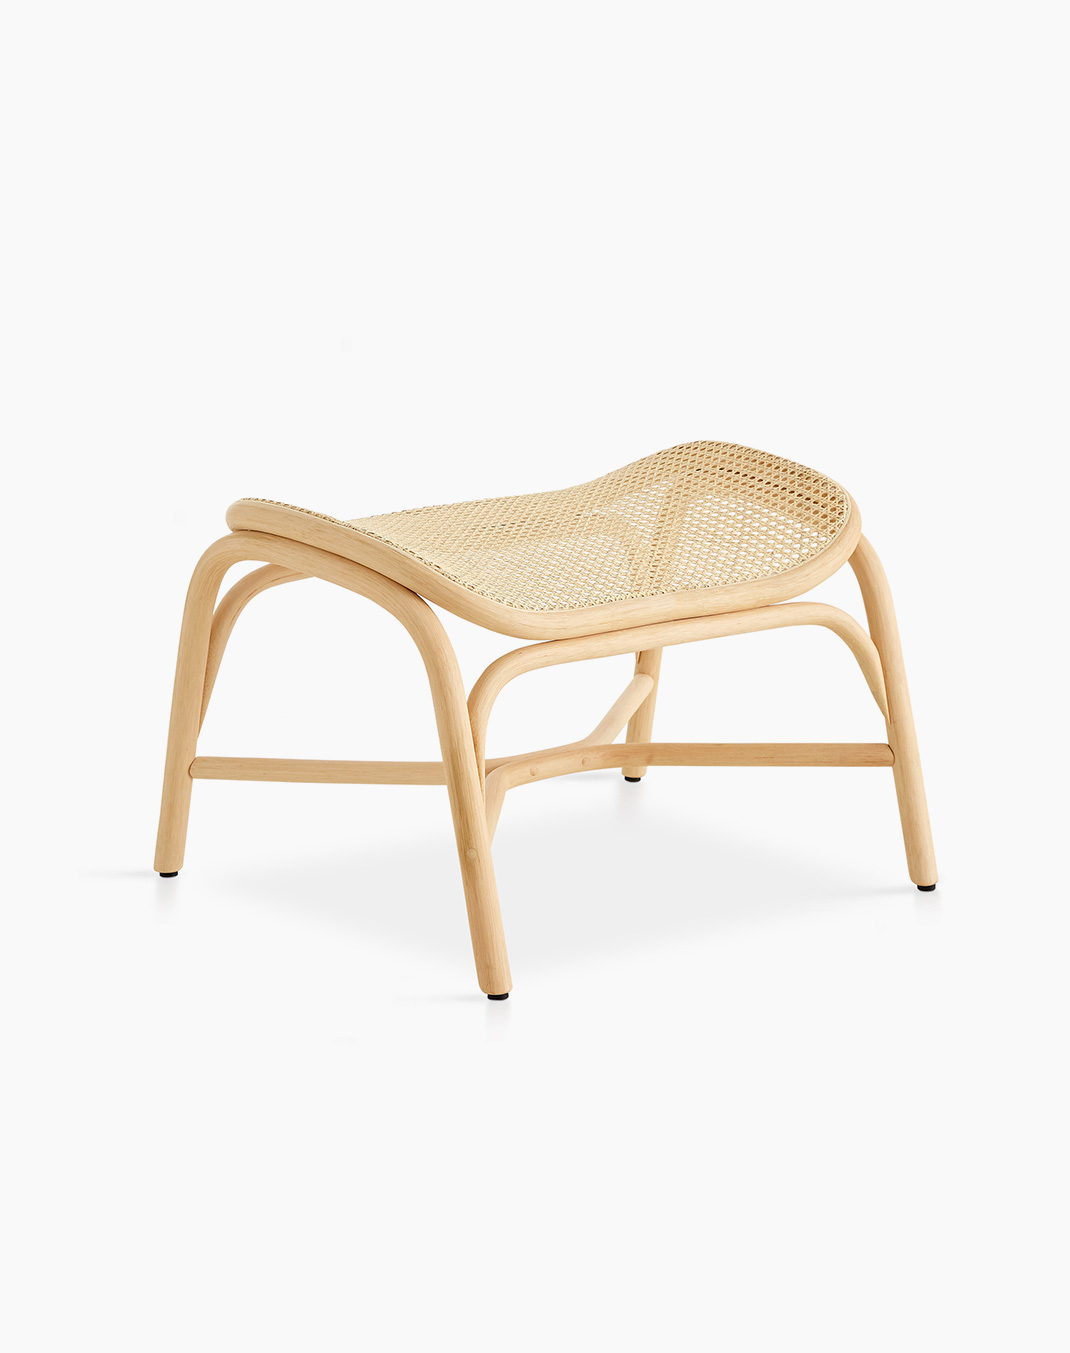 TinnappleMetz-Expormim-Frames-footstool-01